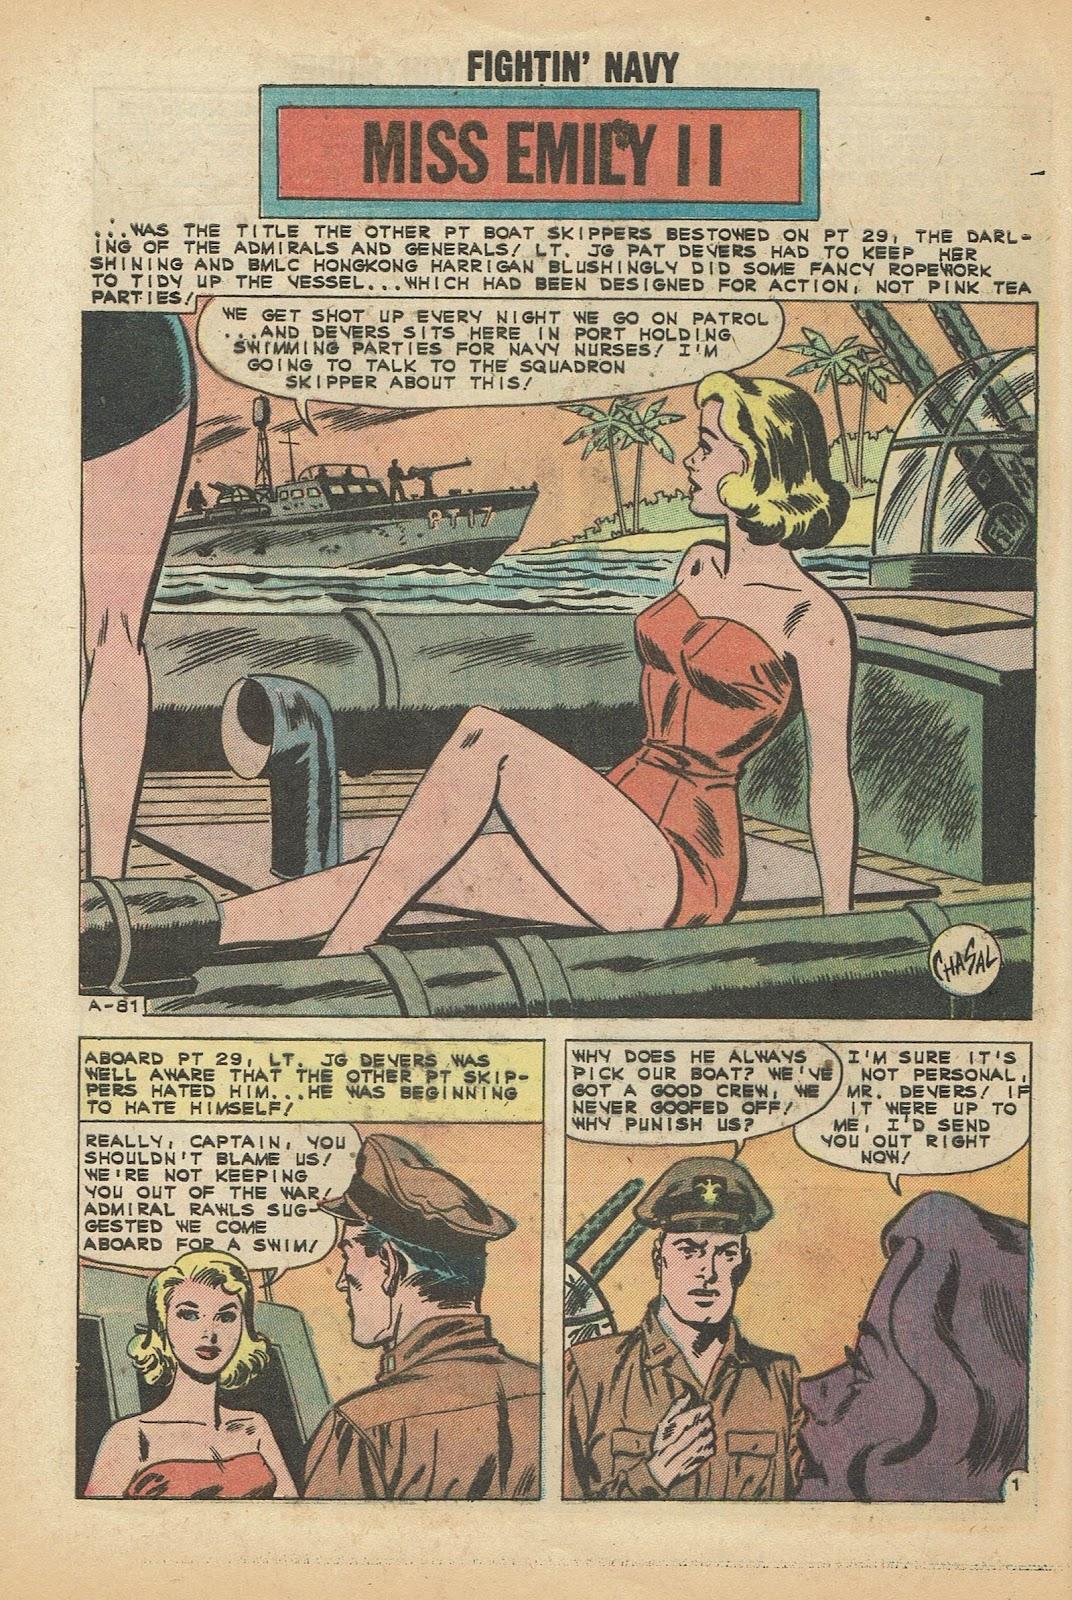 Read online Fightin' Navy comic -  Issue #97 - 28